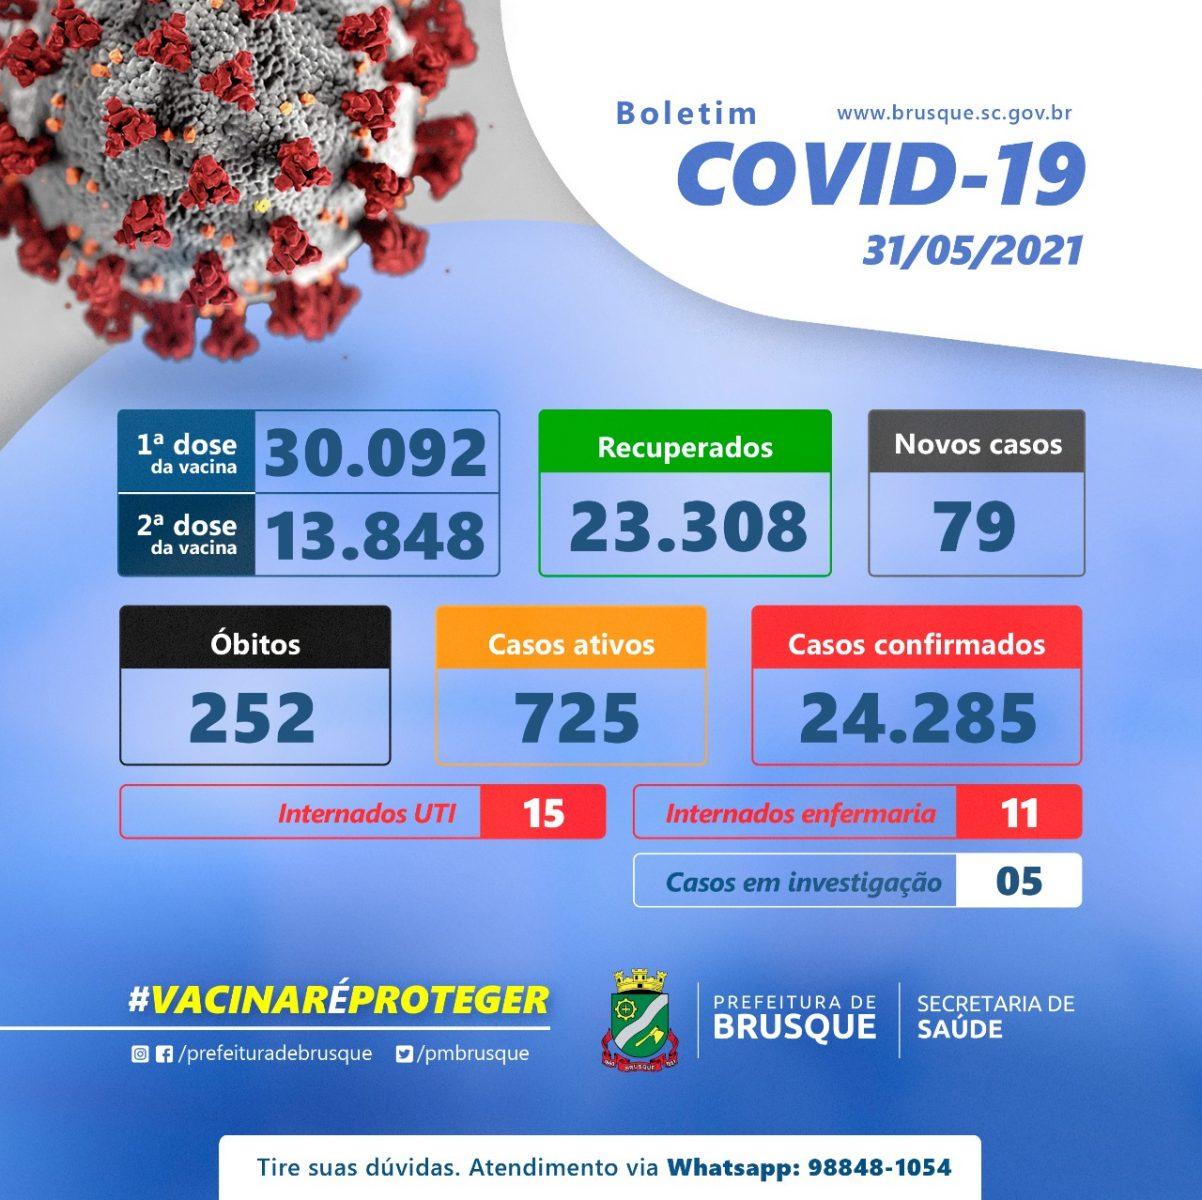 Covid-19: Confira o boletim epidemiológico desta segunda-feira (31)